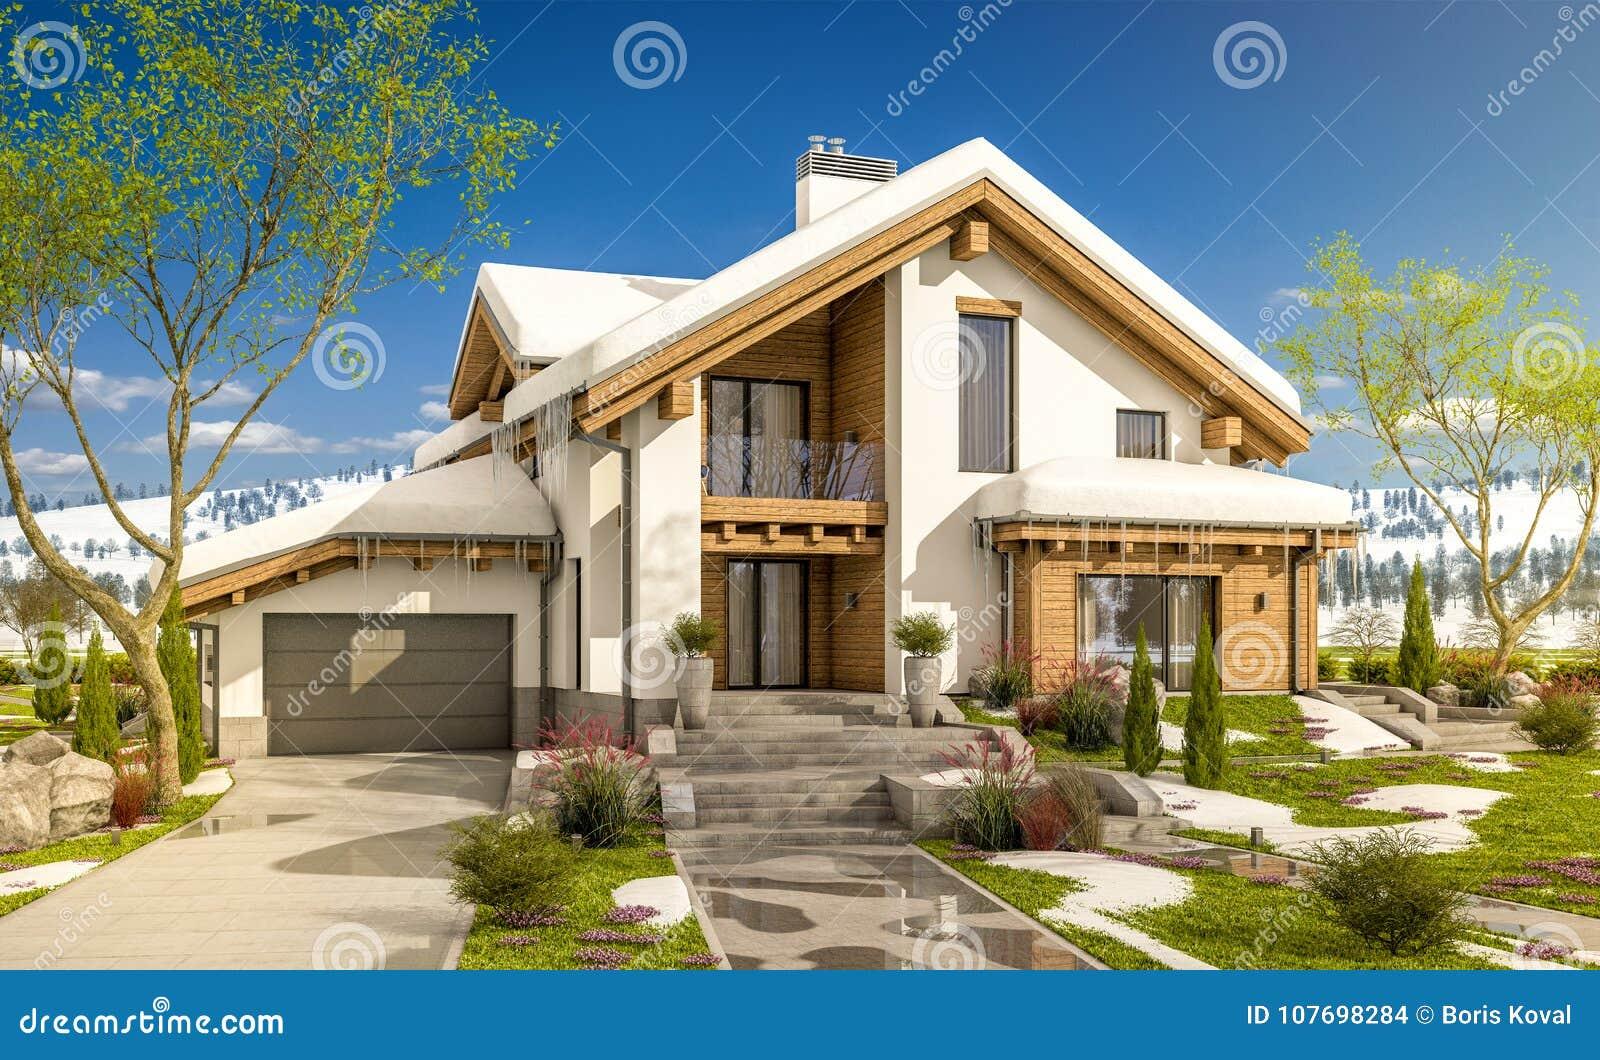 3d rendering of spring modern cozy house in chalet style stock illustration illustration of - Moderner chalet stil ...